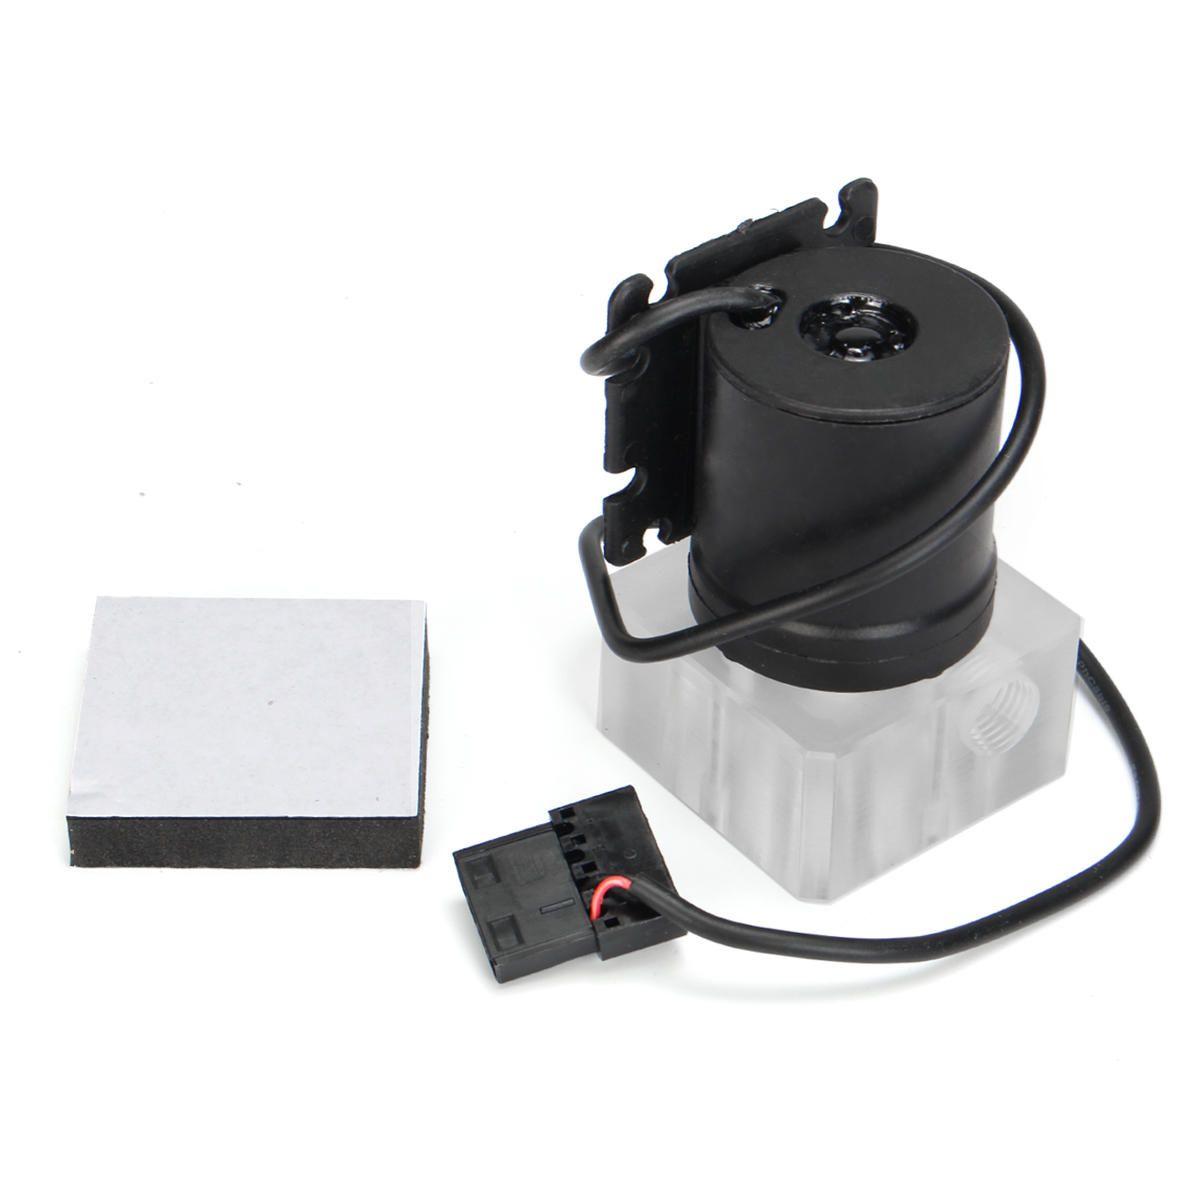 Pc Water Cooling Kit 240mm Radiator Pump Reservoir Cpu Block Rigid